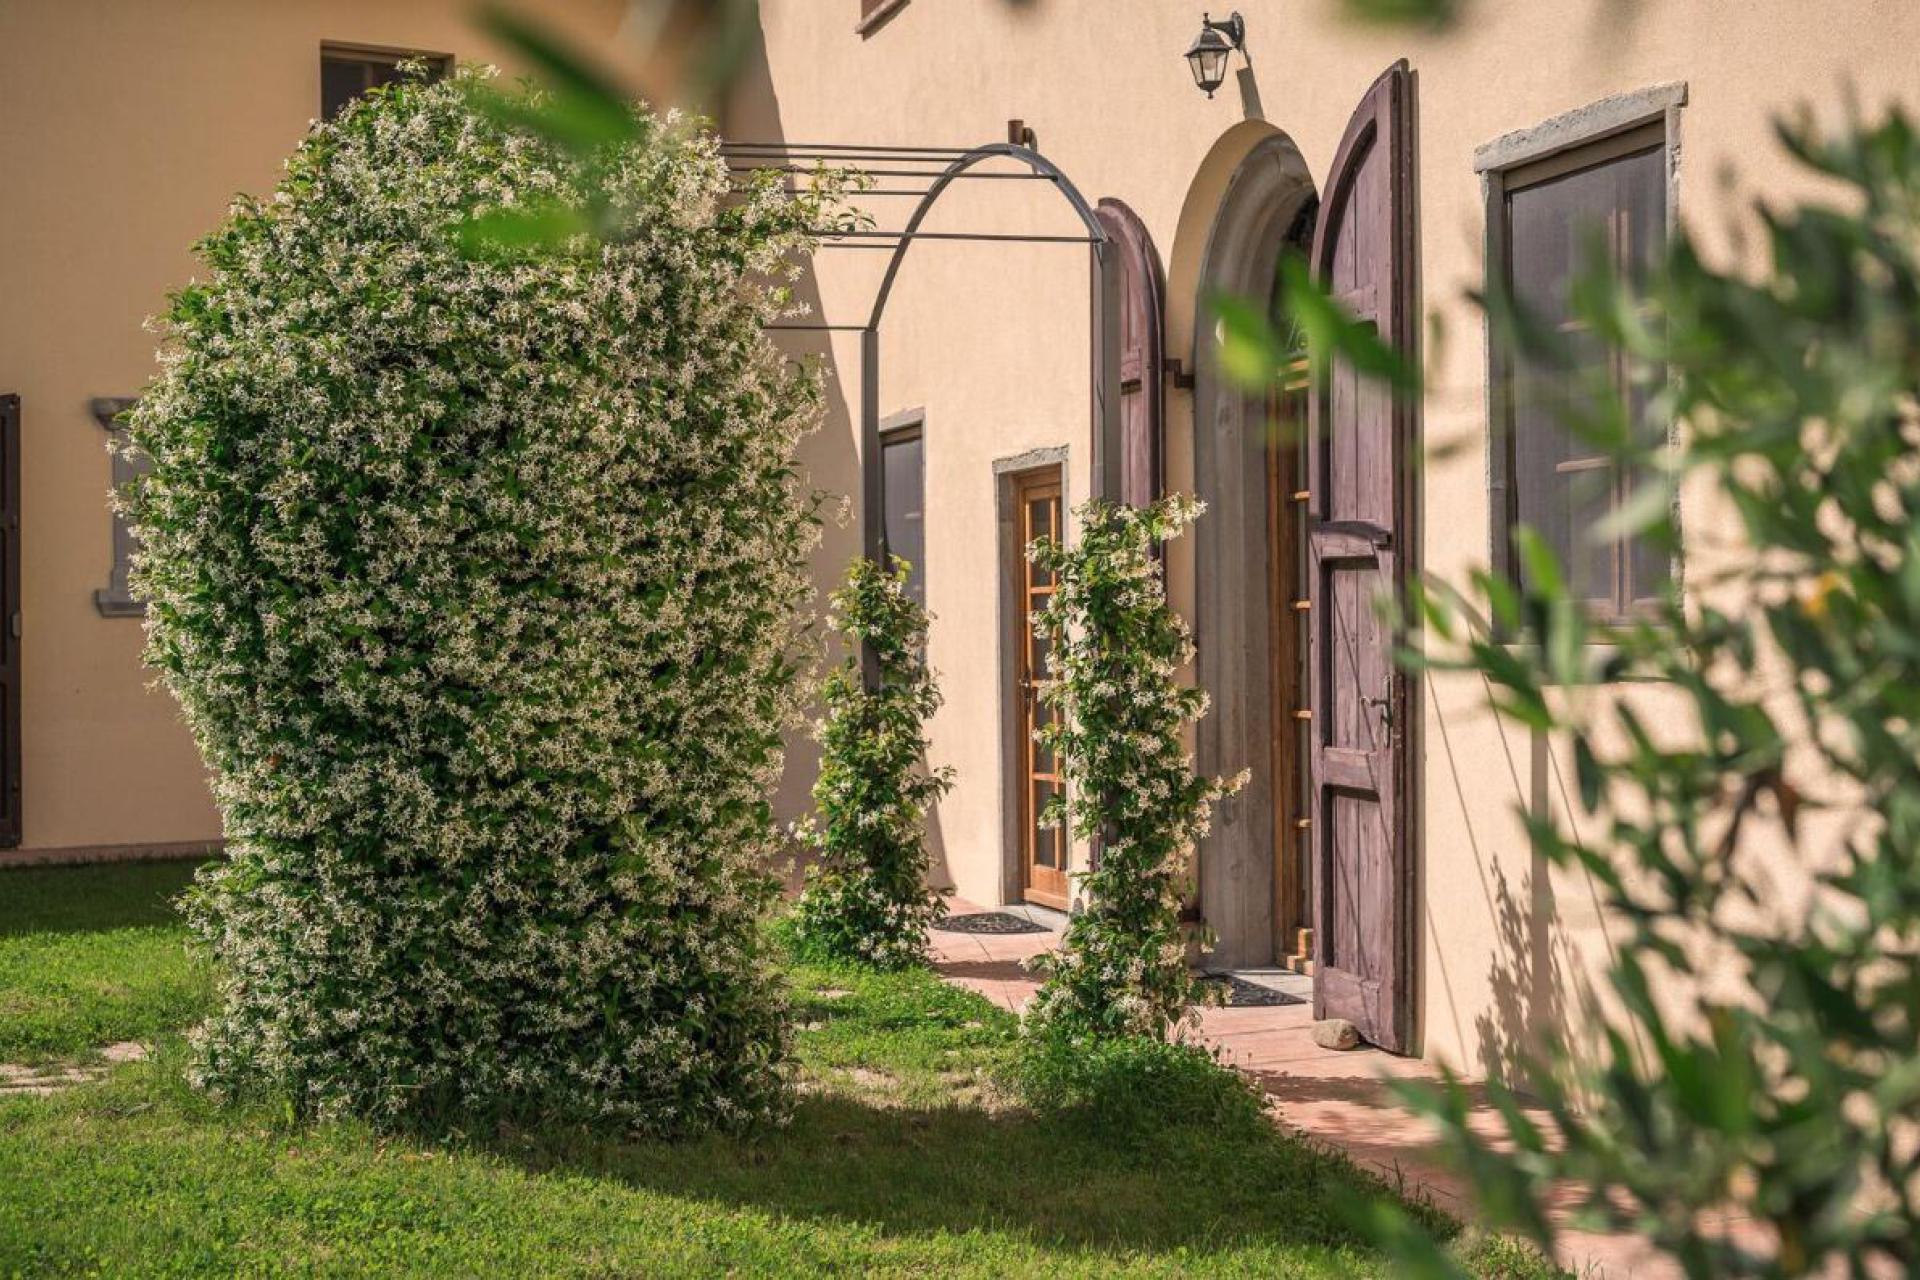 Agriturismo Toscane Rustig gelegen agriturismo in Toscane met mooi uitzicht